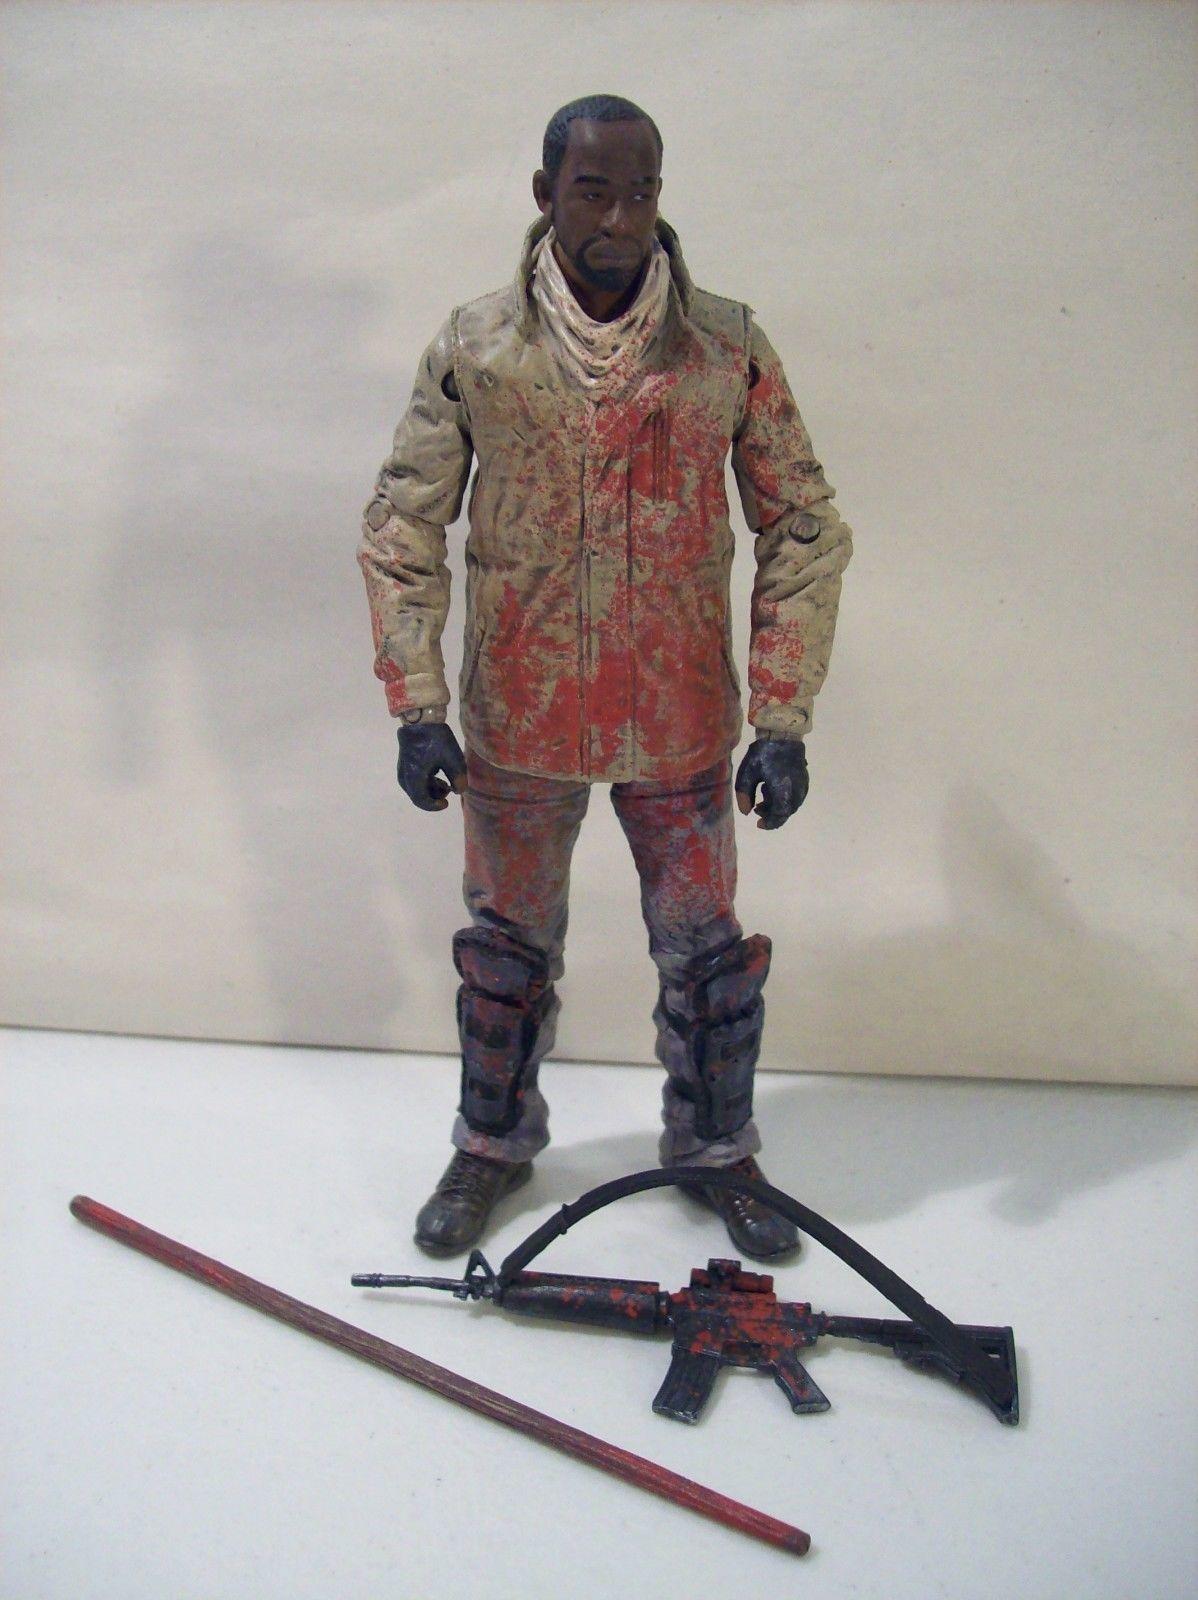 MCFARLANE AMC'S THE WALKING DEAD BLOODY MORGAN JONES ACTION FIGURE RIFLE STAFF